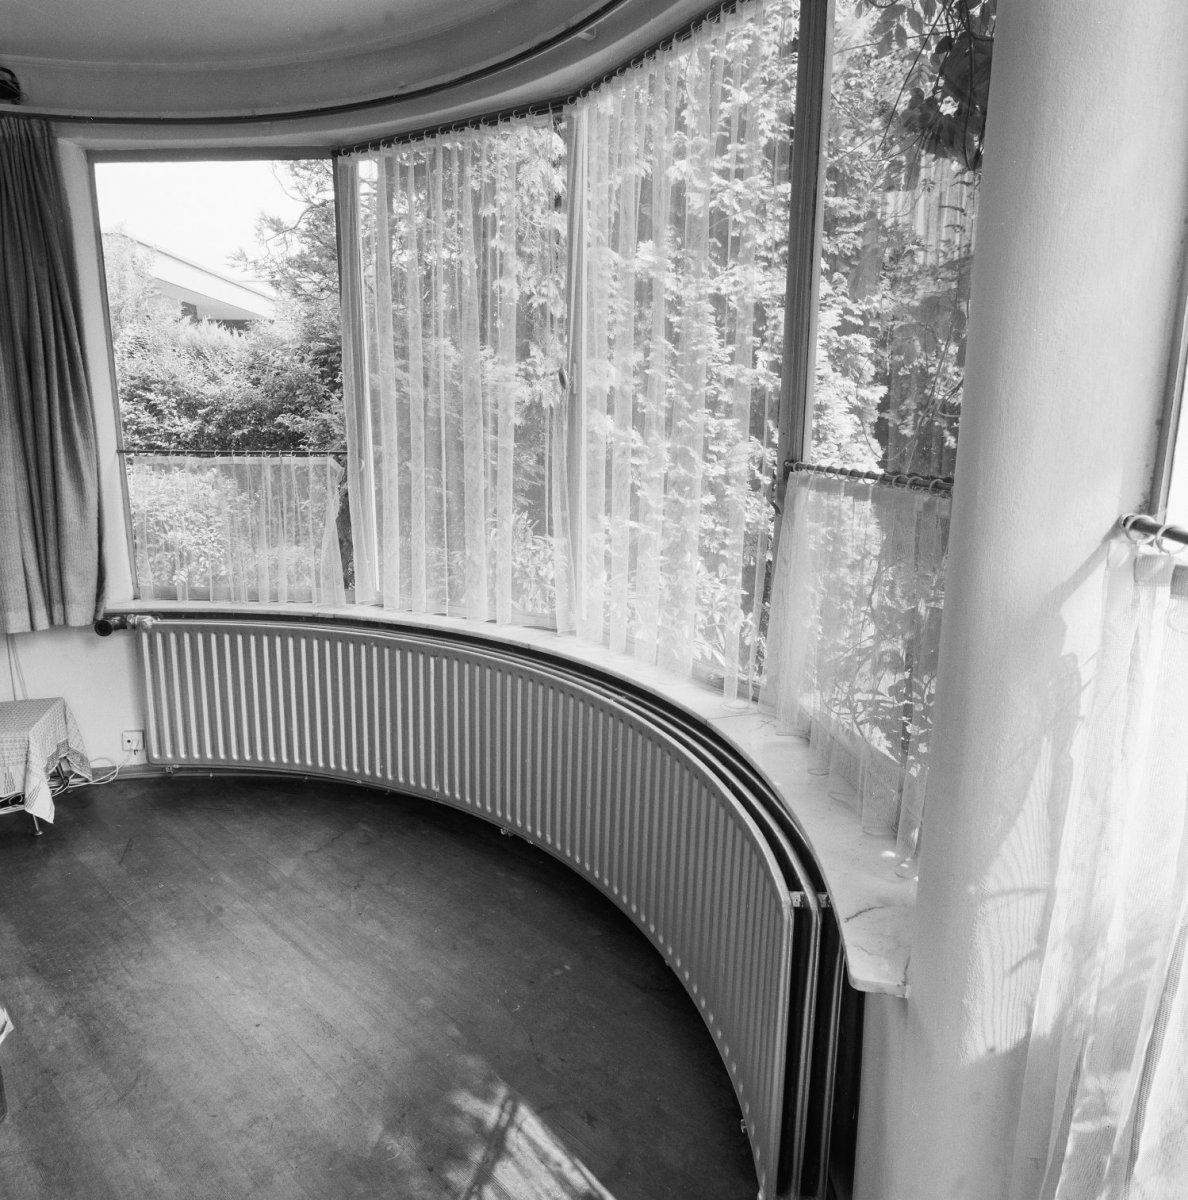 File:Interieur, woonkamer, rondlopende centrale verwarming - Utrecht ...